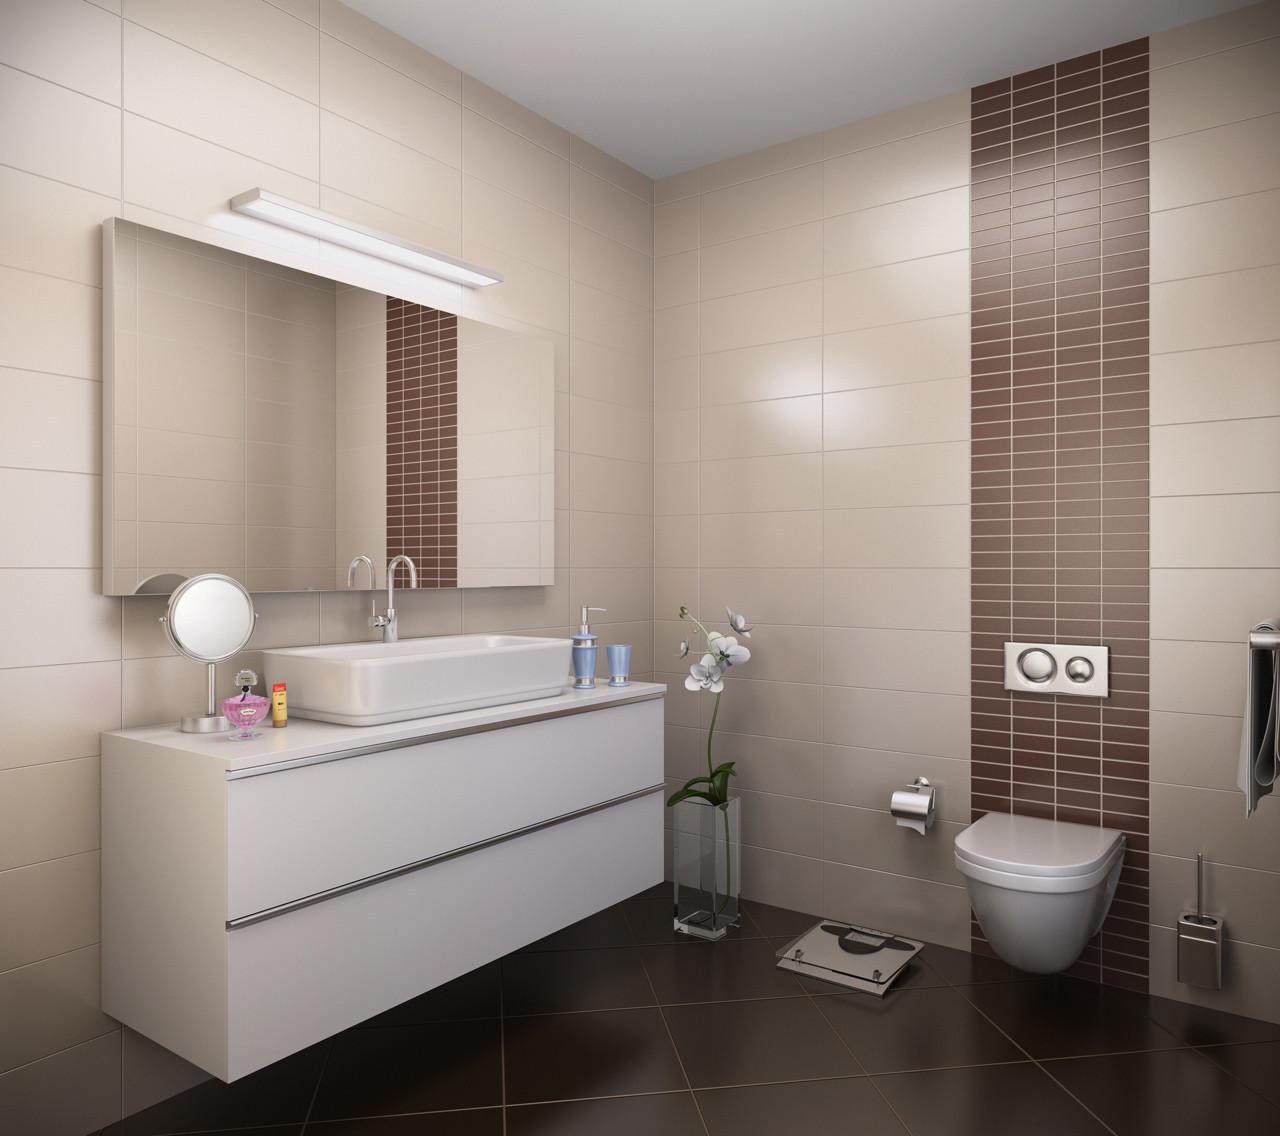 3ds max bathroom interior on Bathroom Model Design  id=35834